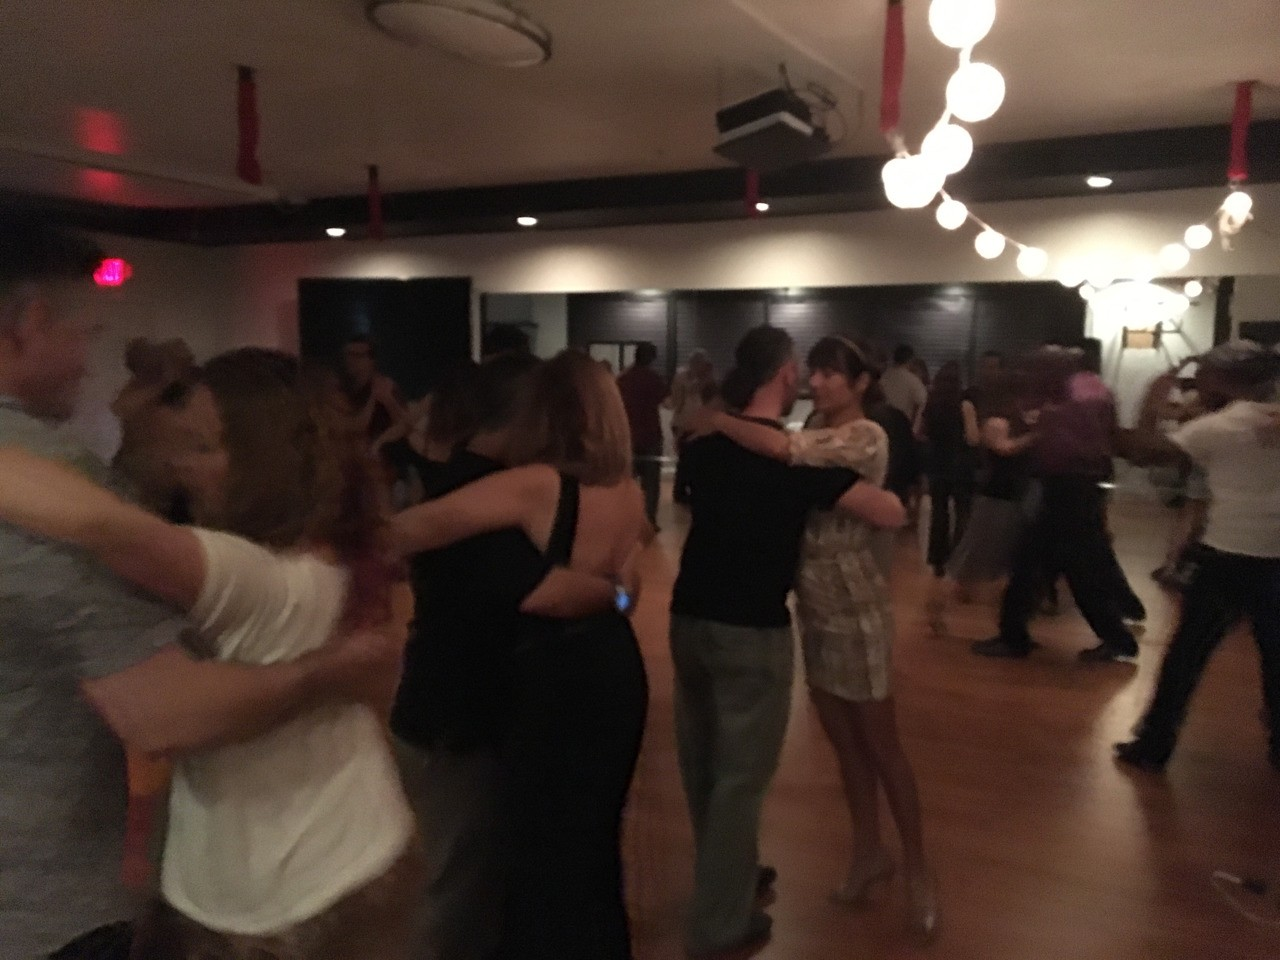 Every Wednesday @8pm Tango Classes and Milonga in Miami Beach www.diegosantanatango.com